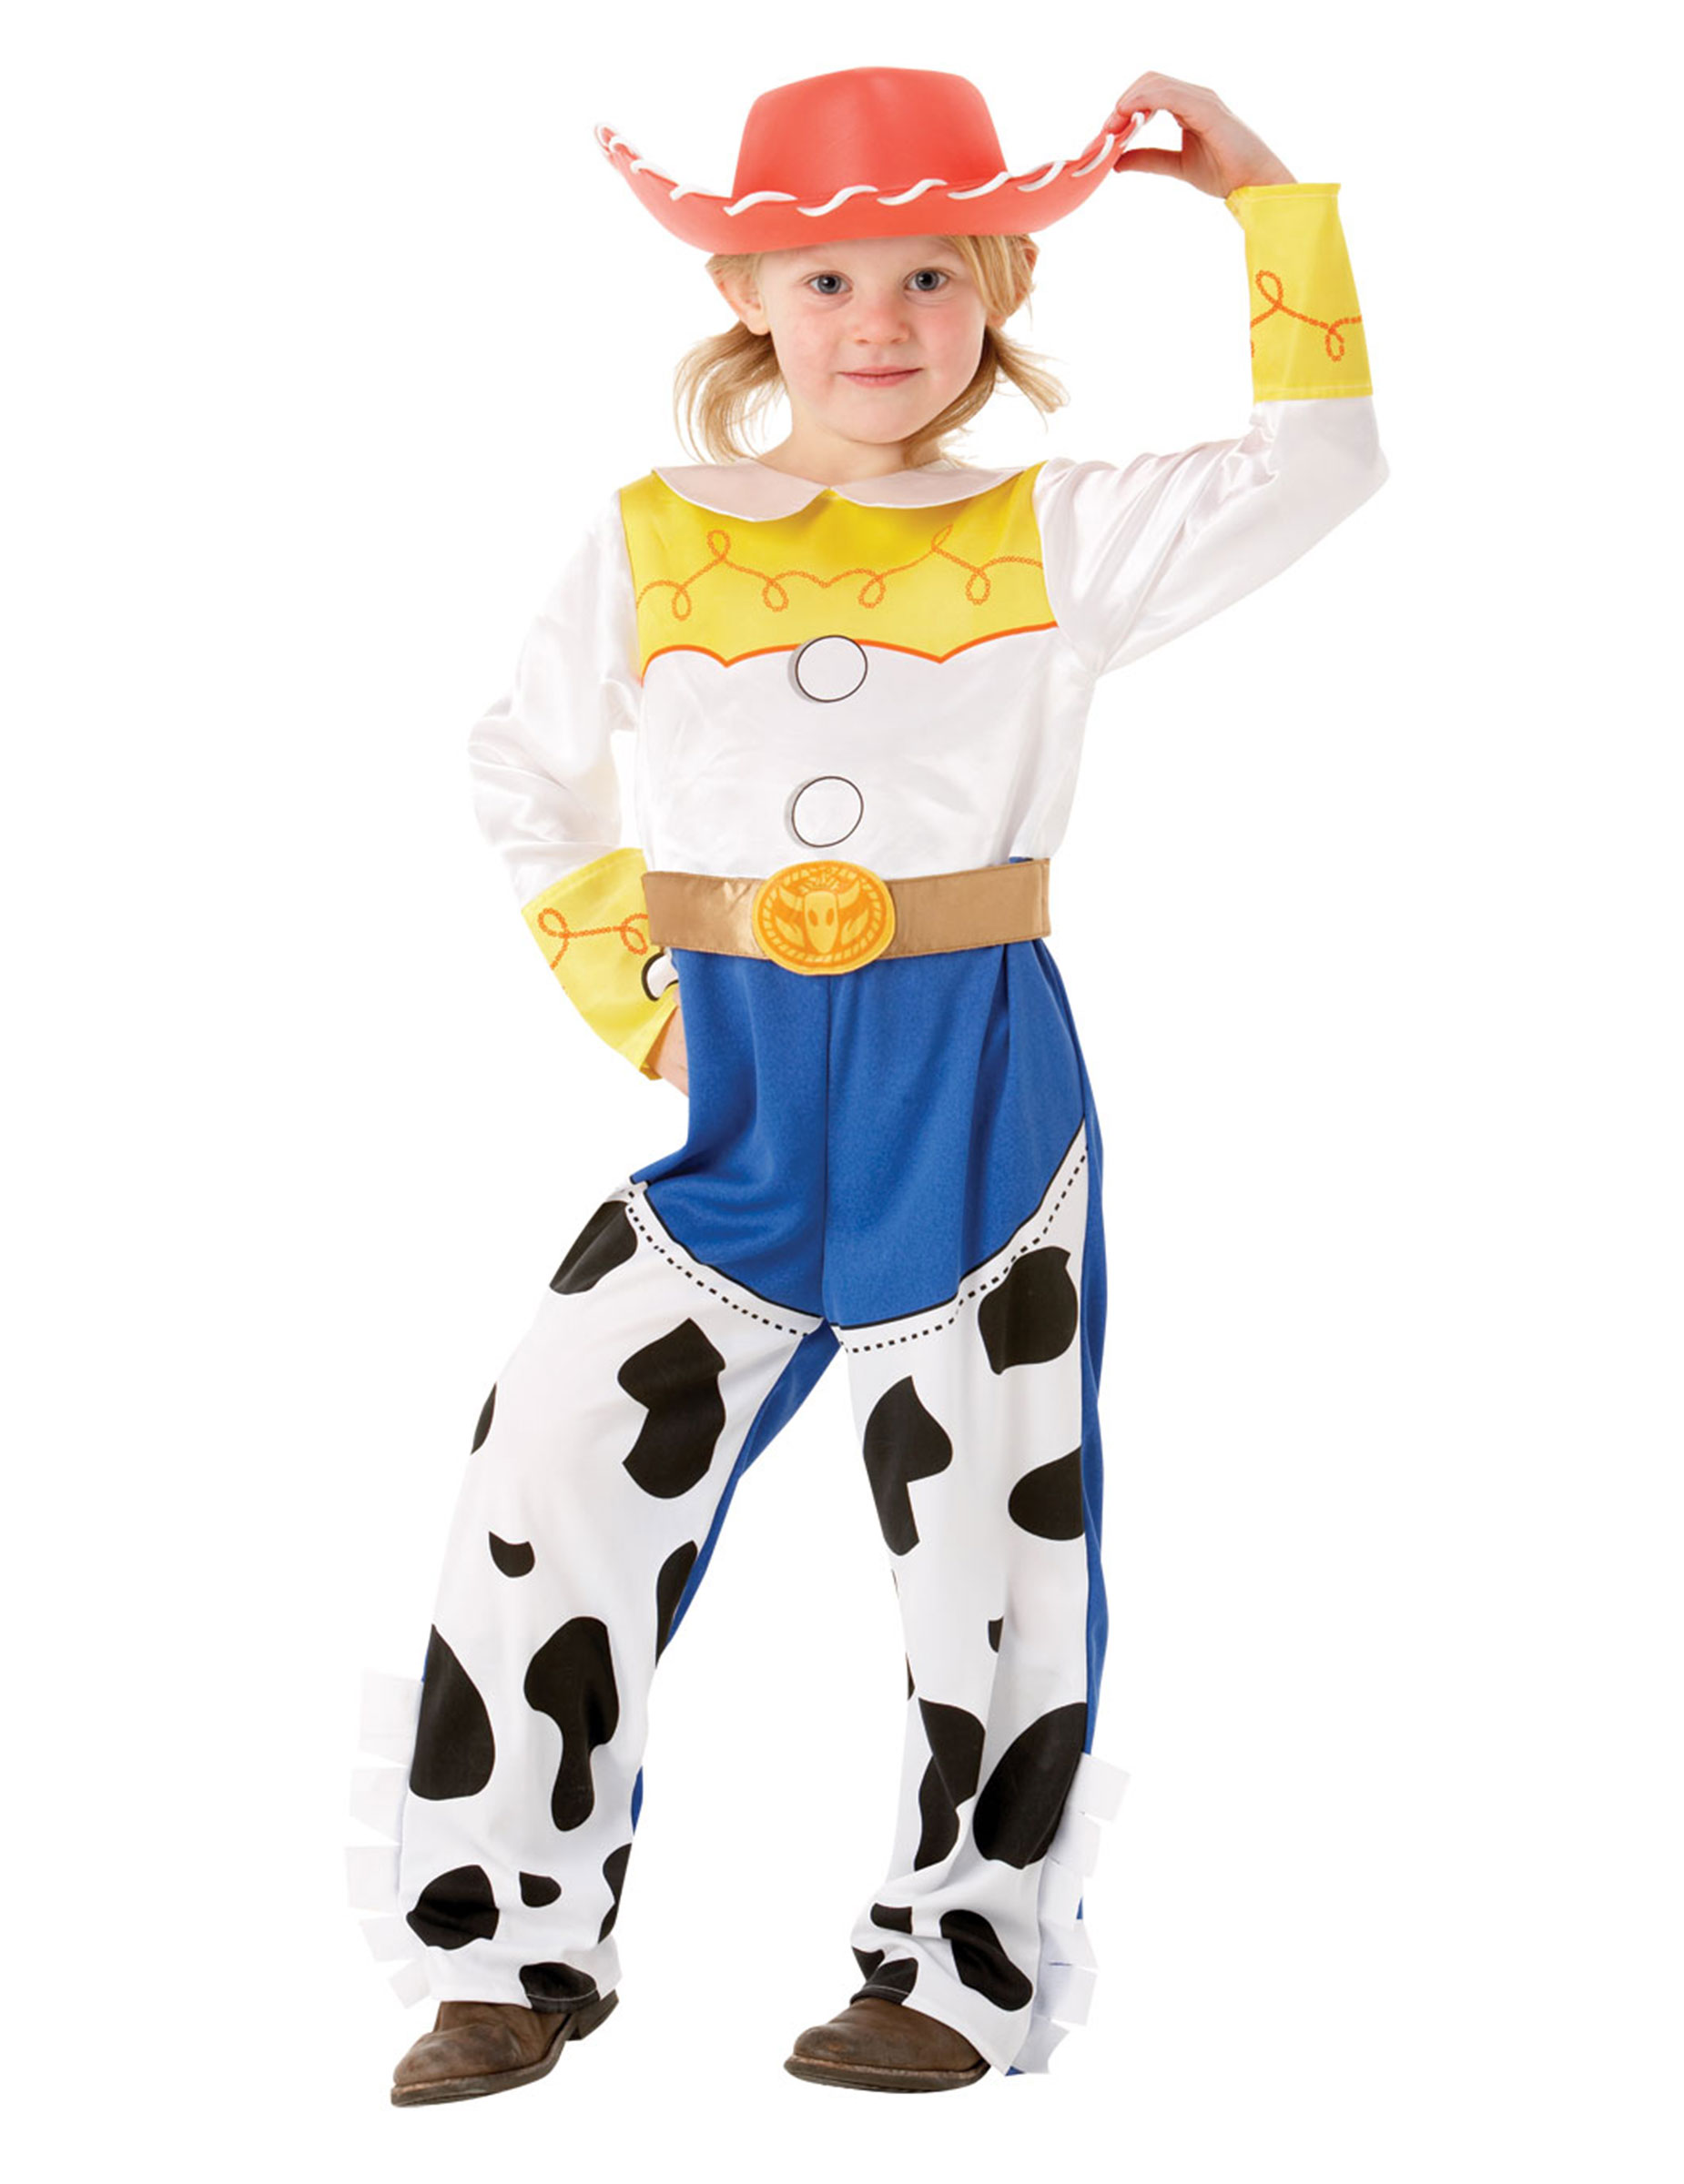 d7a06e846f80a Disfraz Jessie Toy Story™ niña  Disfraces niños